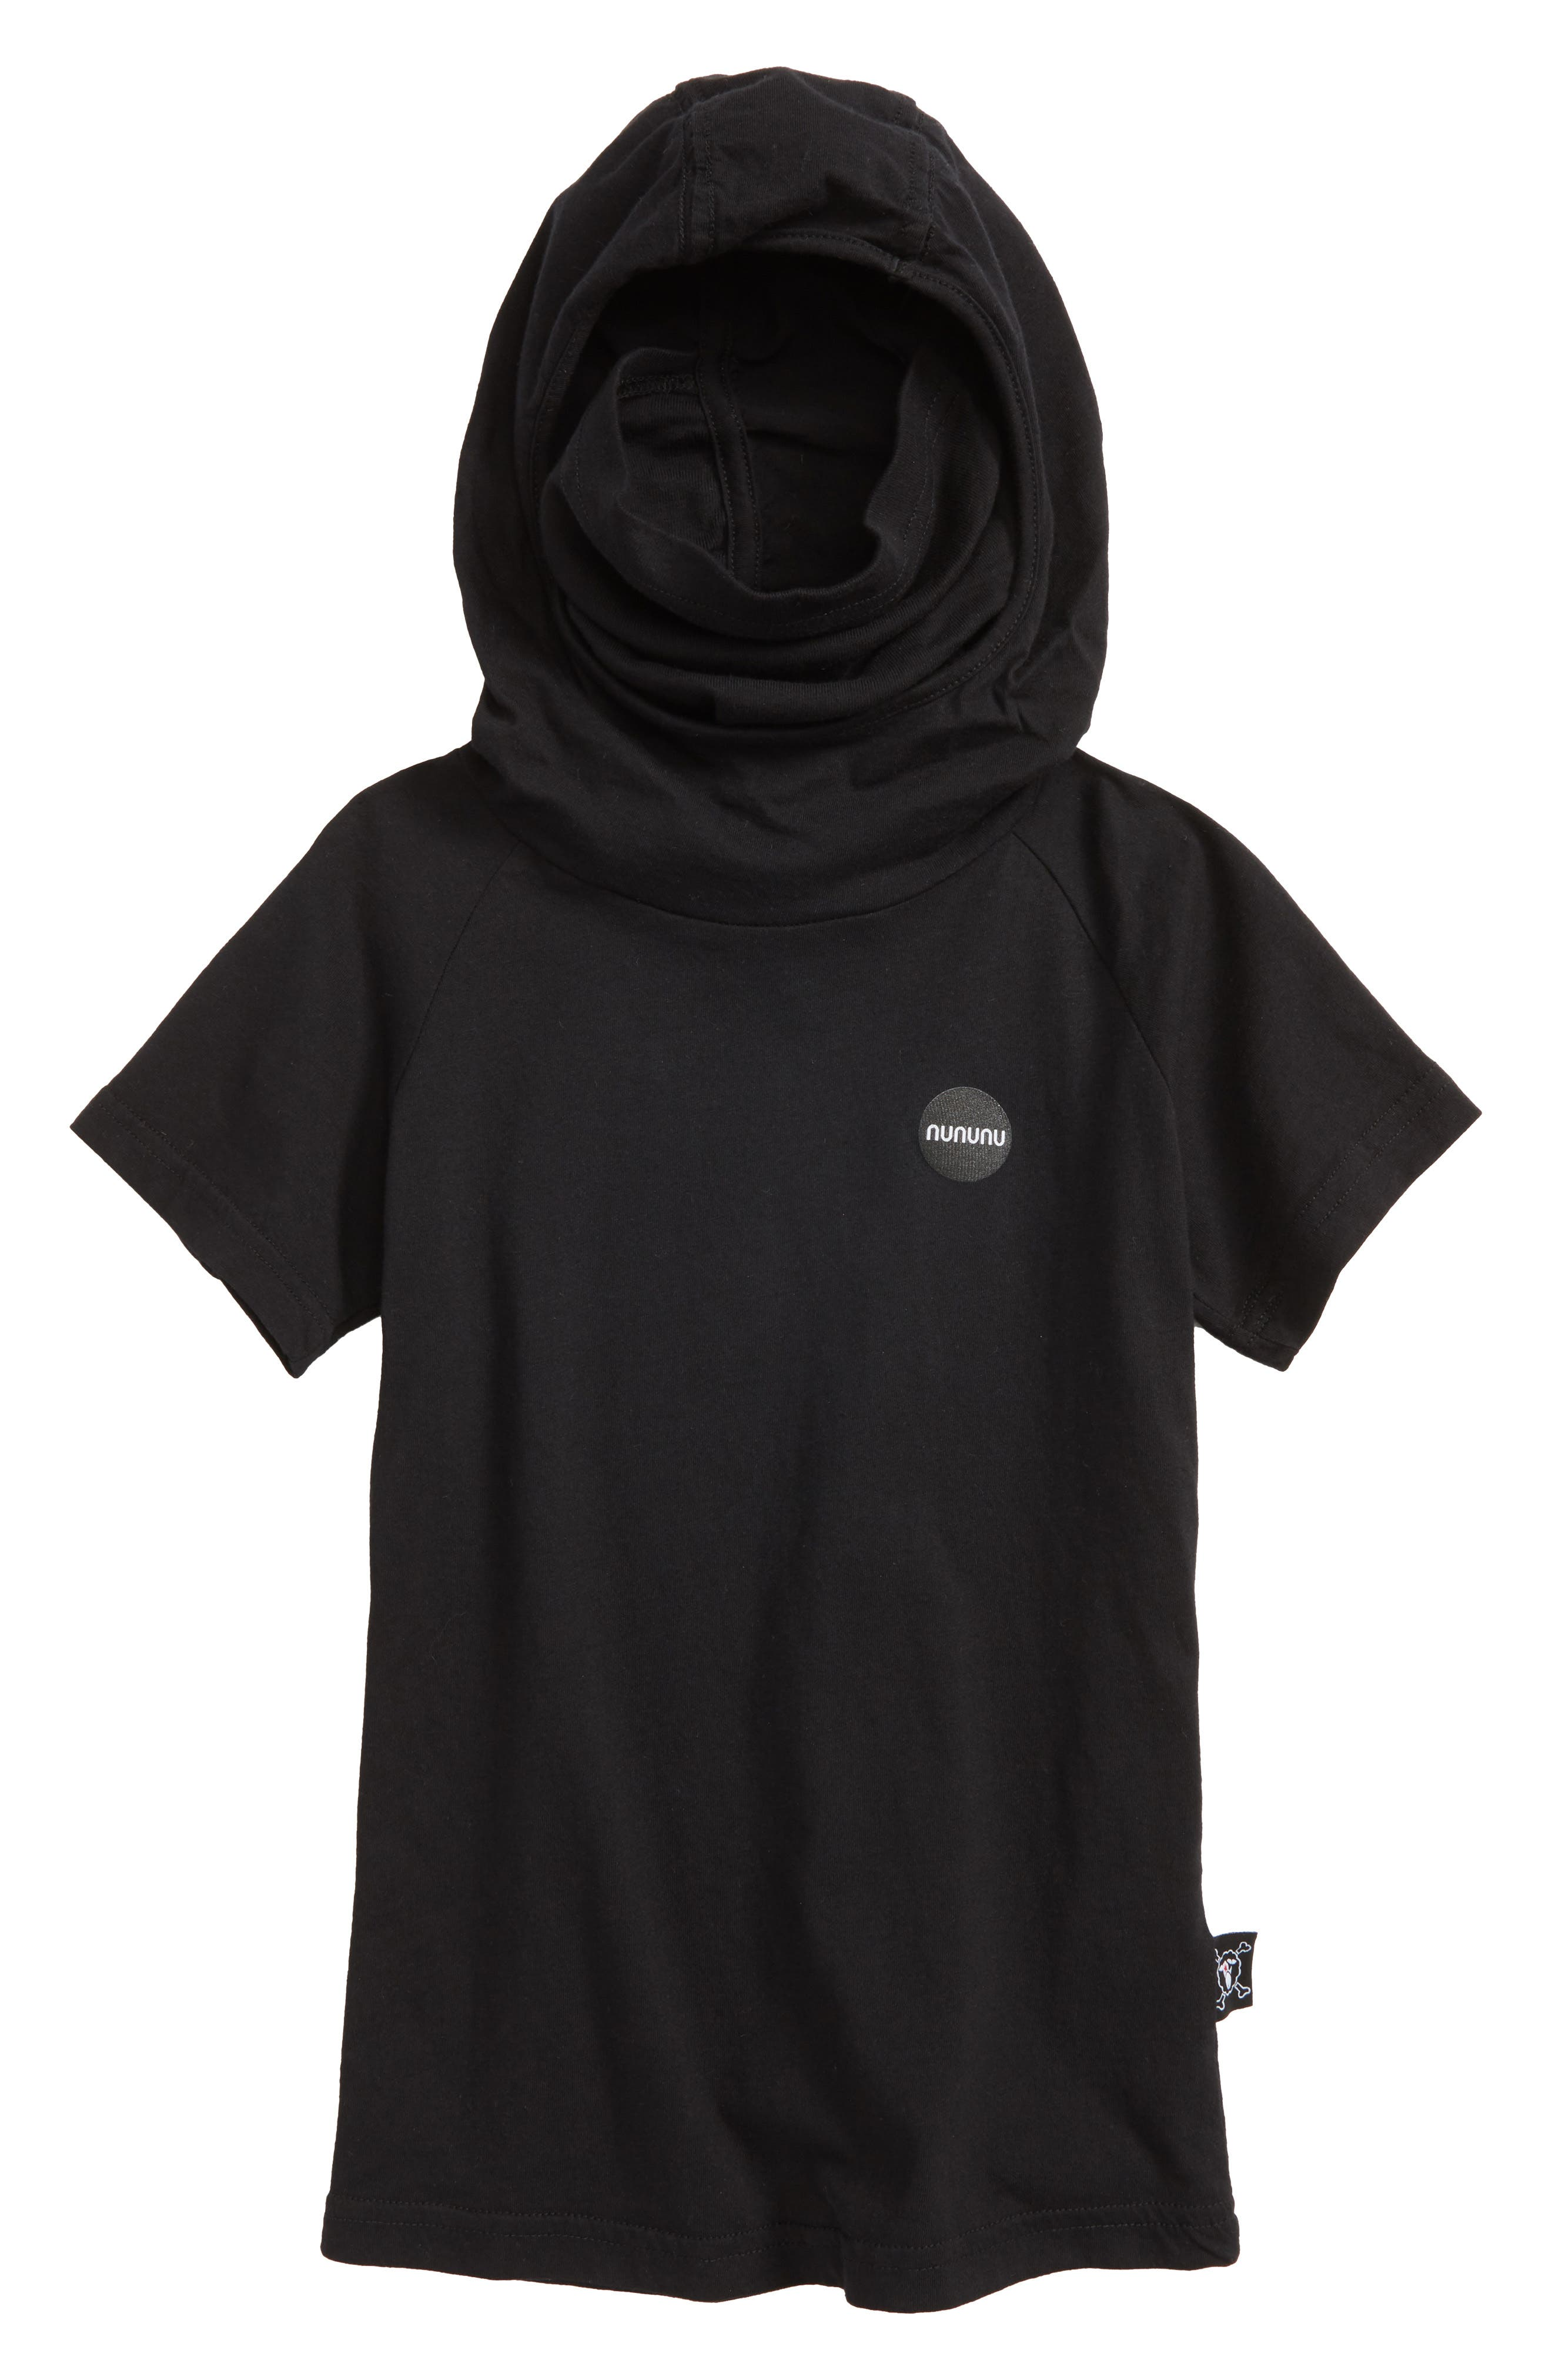 Ninja Hooded T-Shirt,                         Main,                         color,